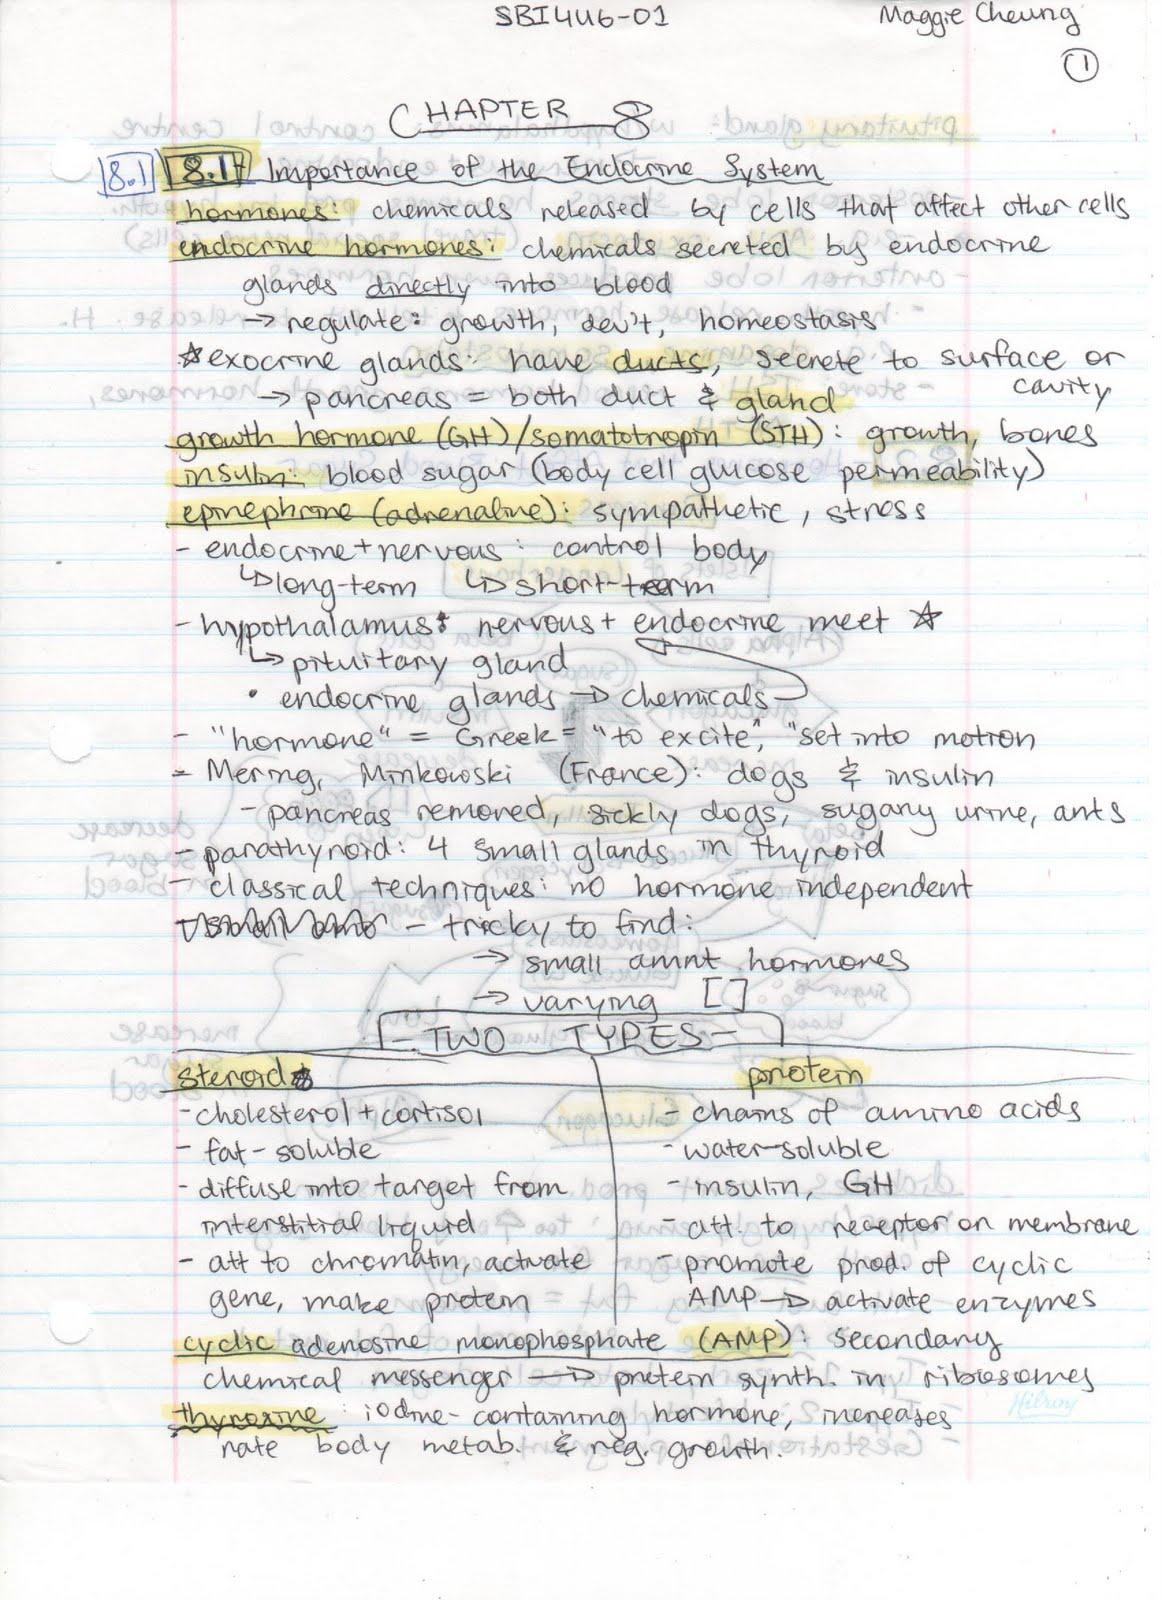 SBI4U601: Chapter 8 Notes  Endocrine System Chart